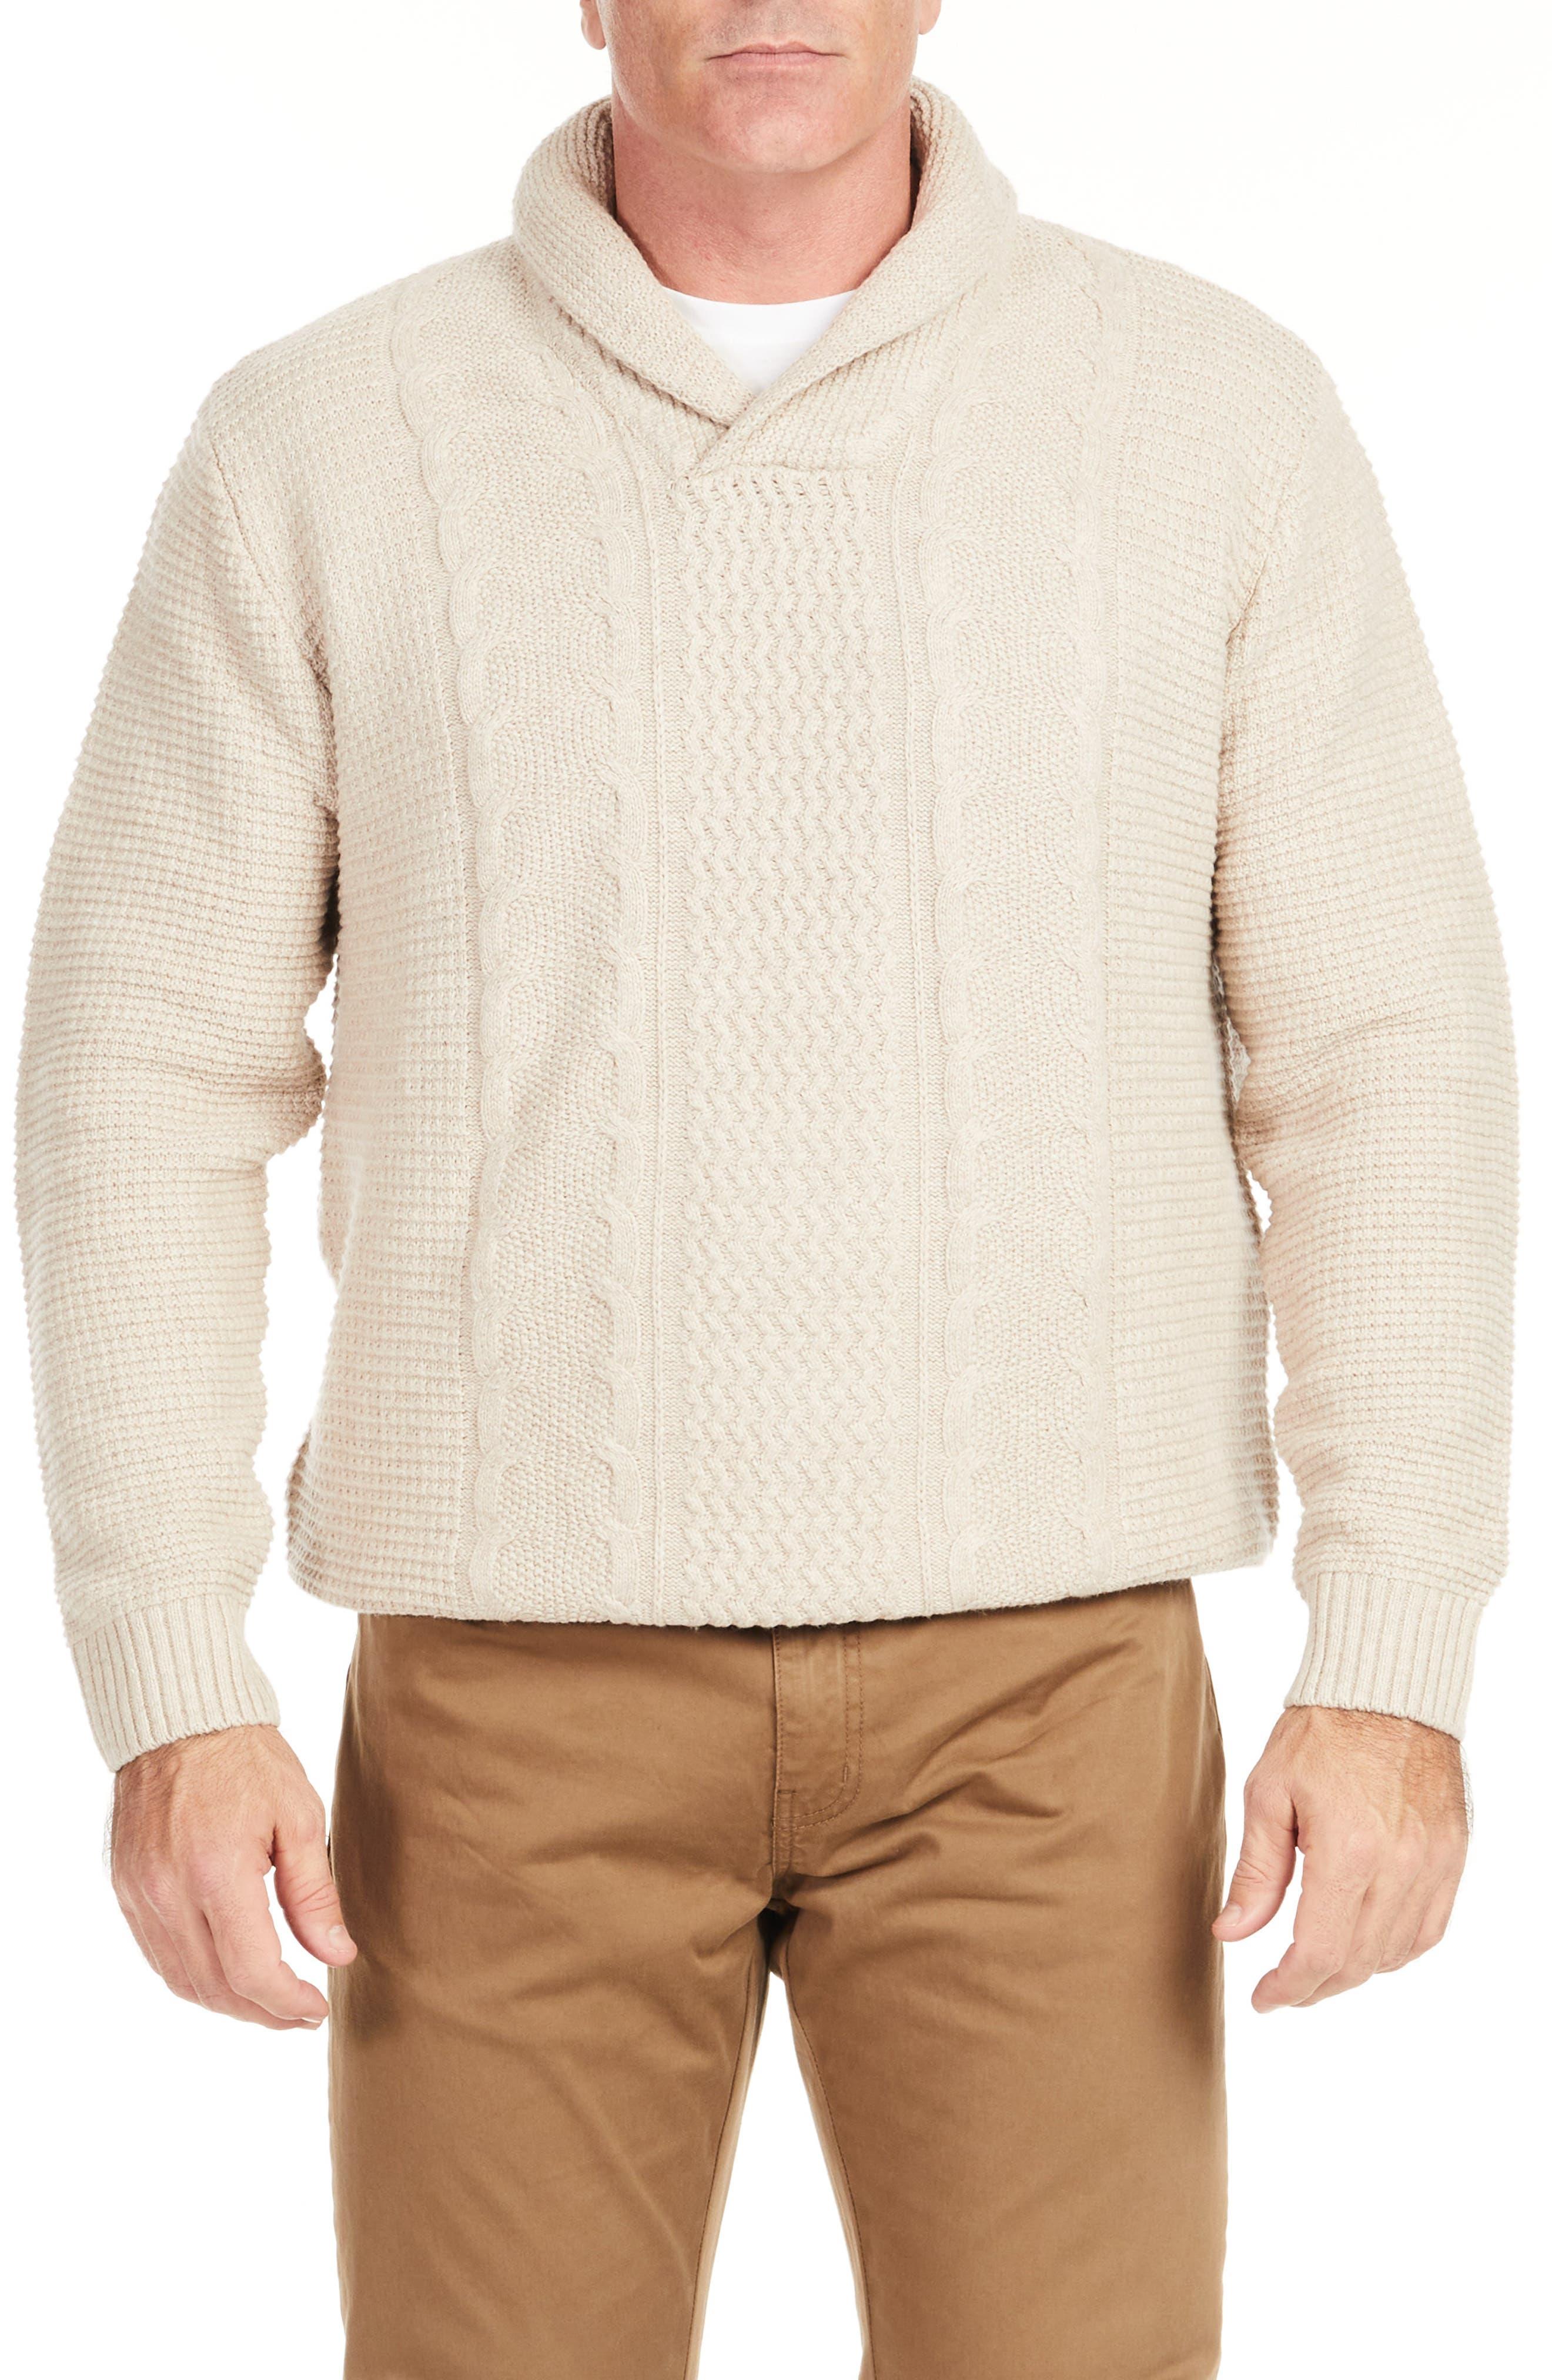 Kingston Shawl Collar Sweater